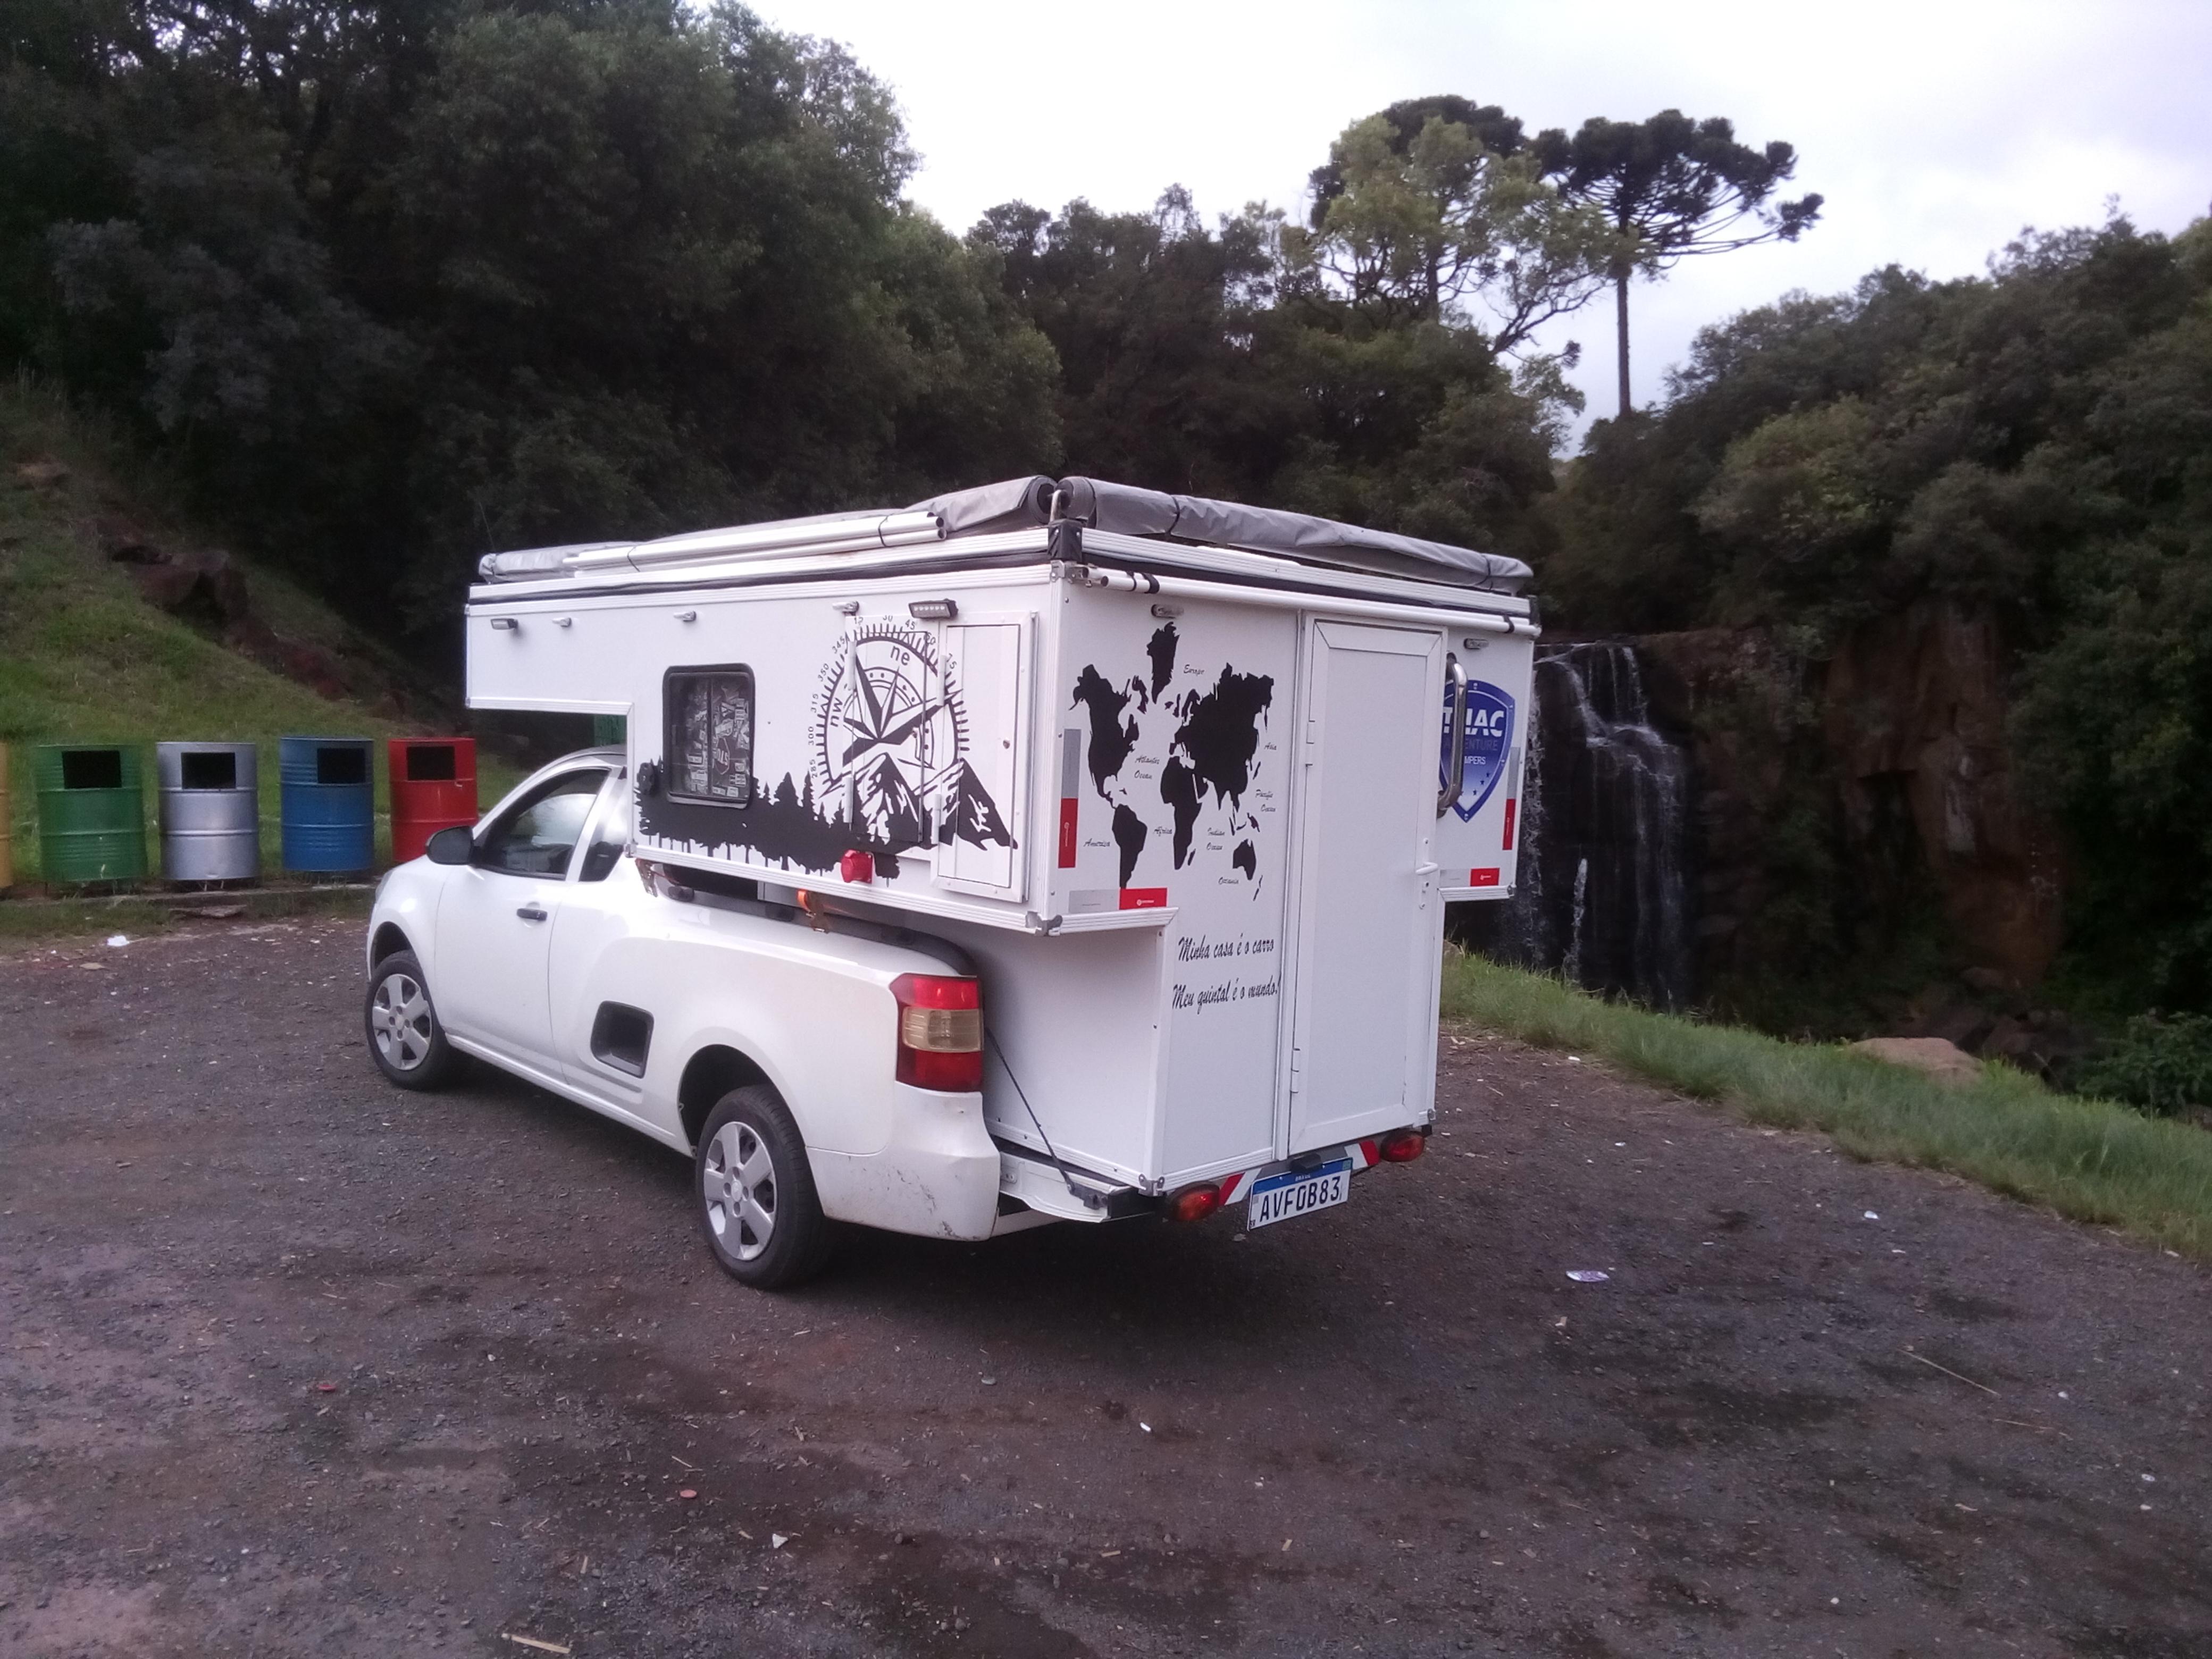 Thac Adventure Camper